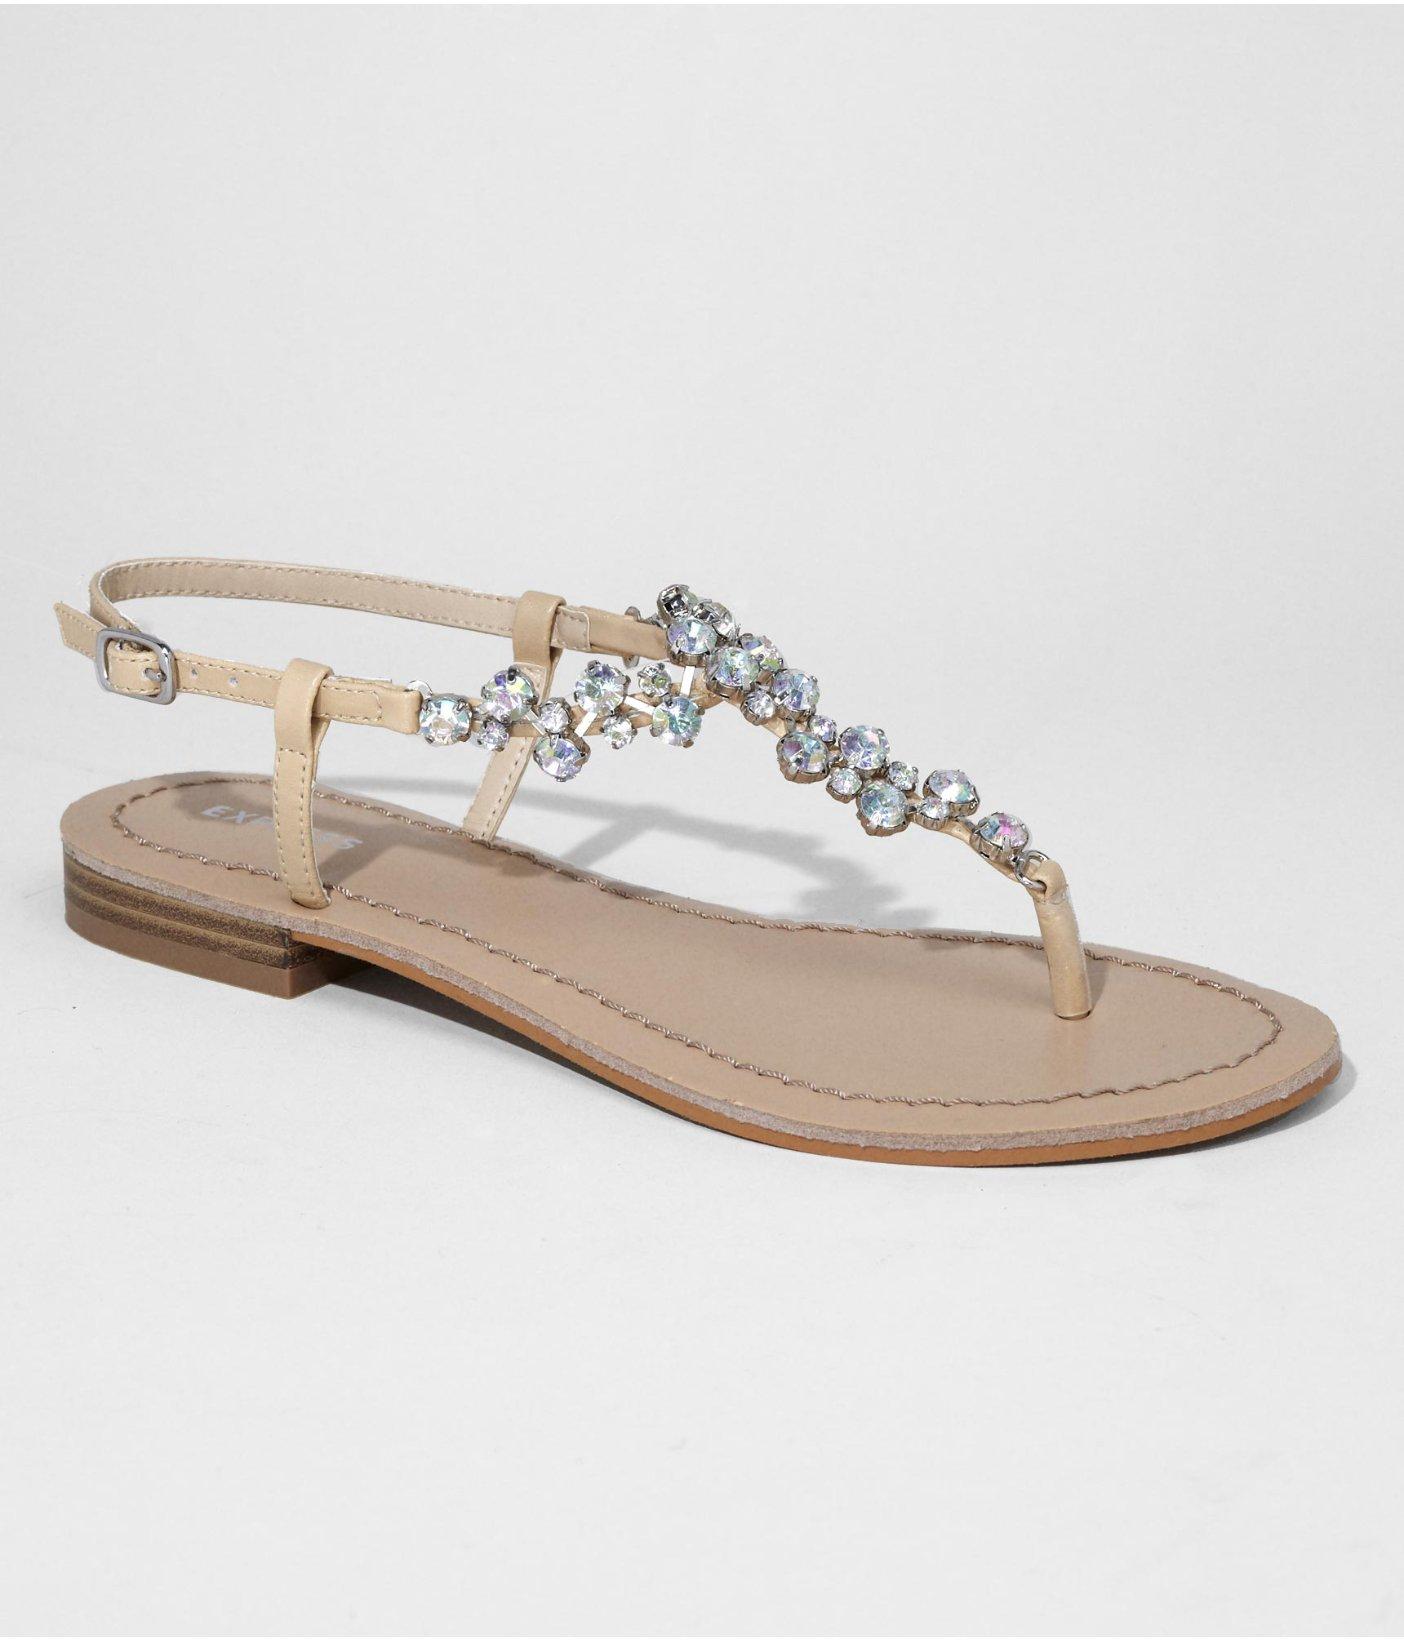 Express Rhinestone Tstrap Sandal In Brown Natural Lyst